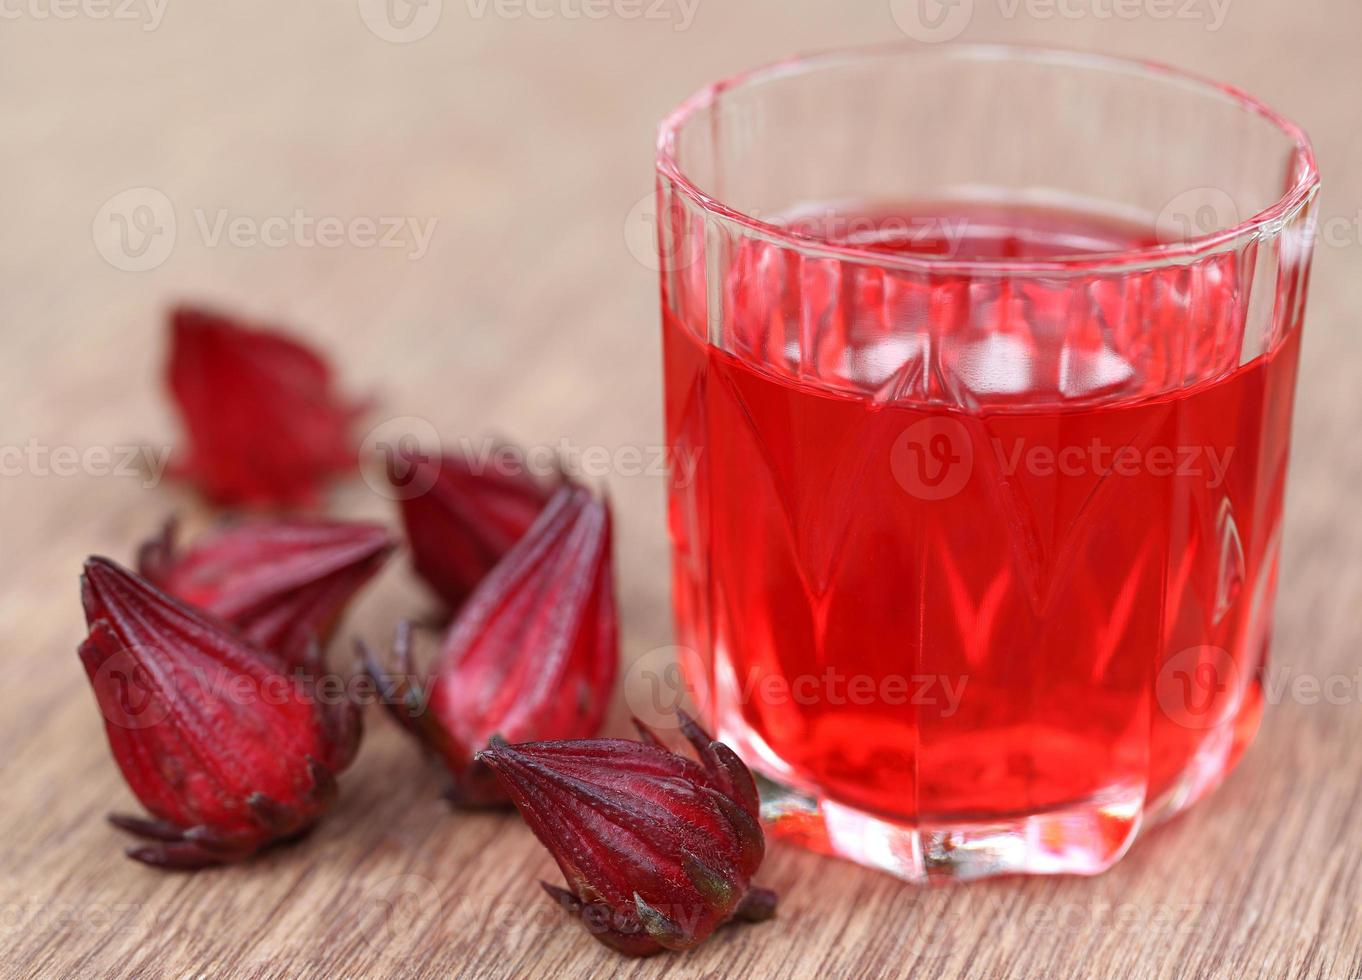 roselle med dryck foto